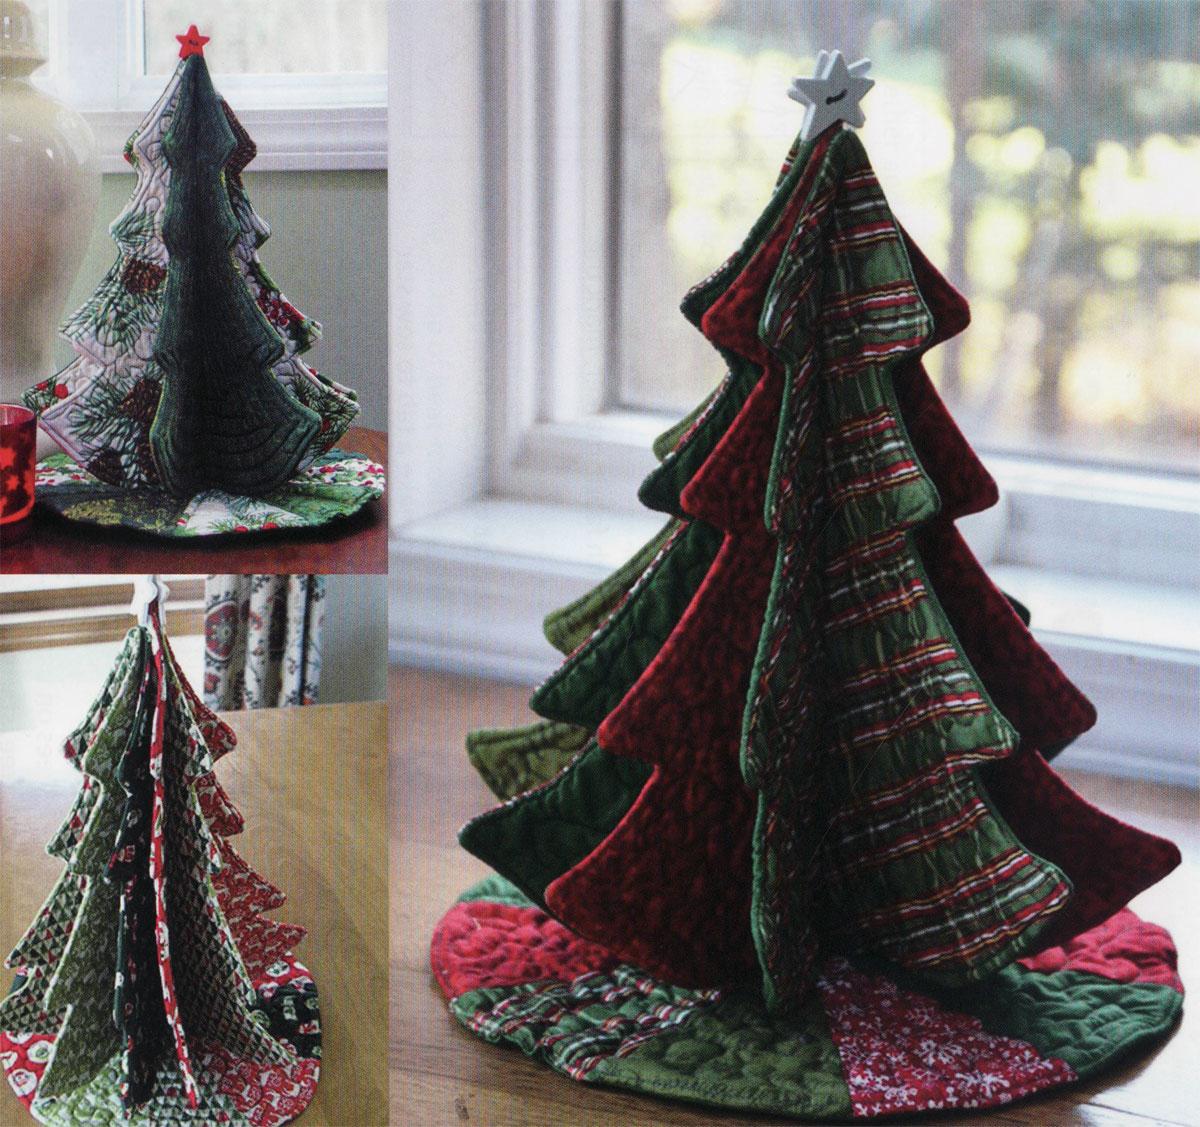 Tabletop-Tannenbaum-sewing-pattern-Poorhouse-Designs-1